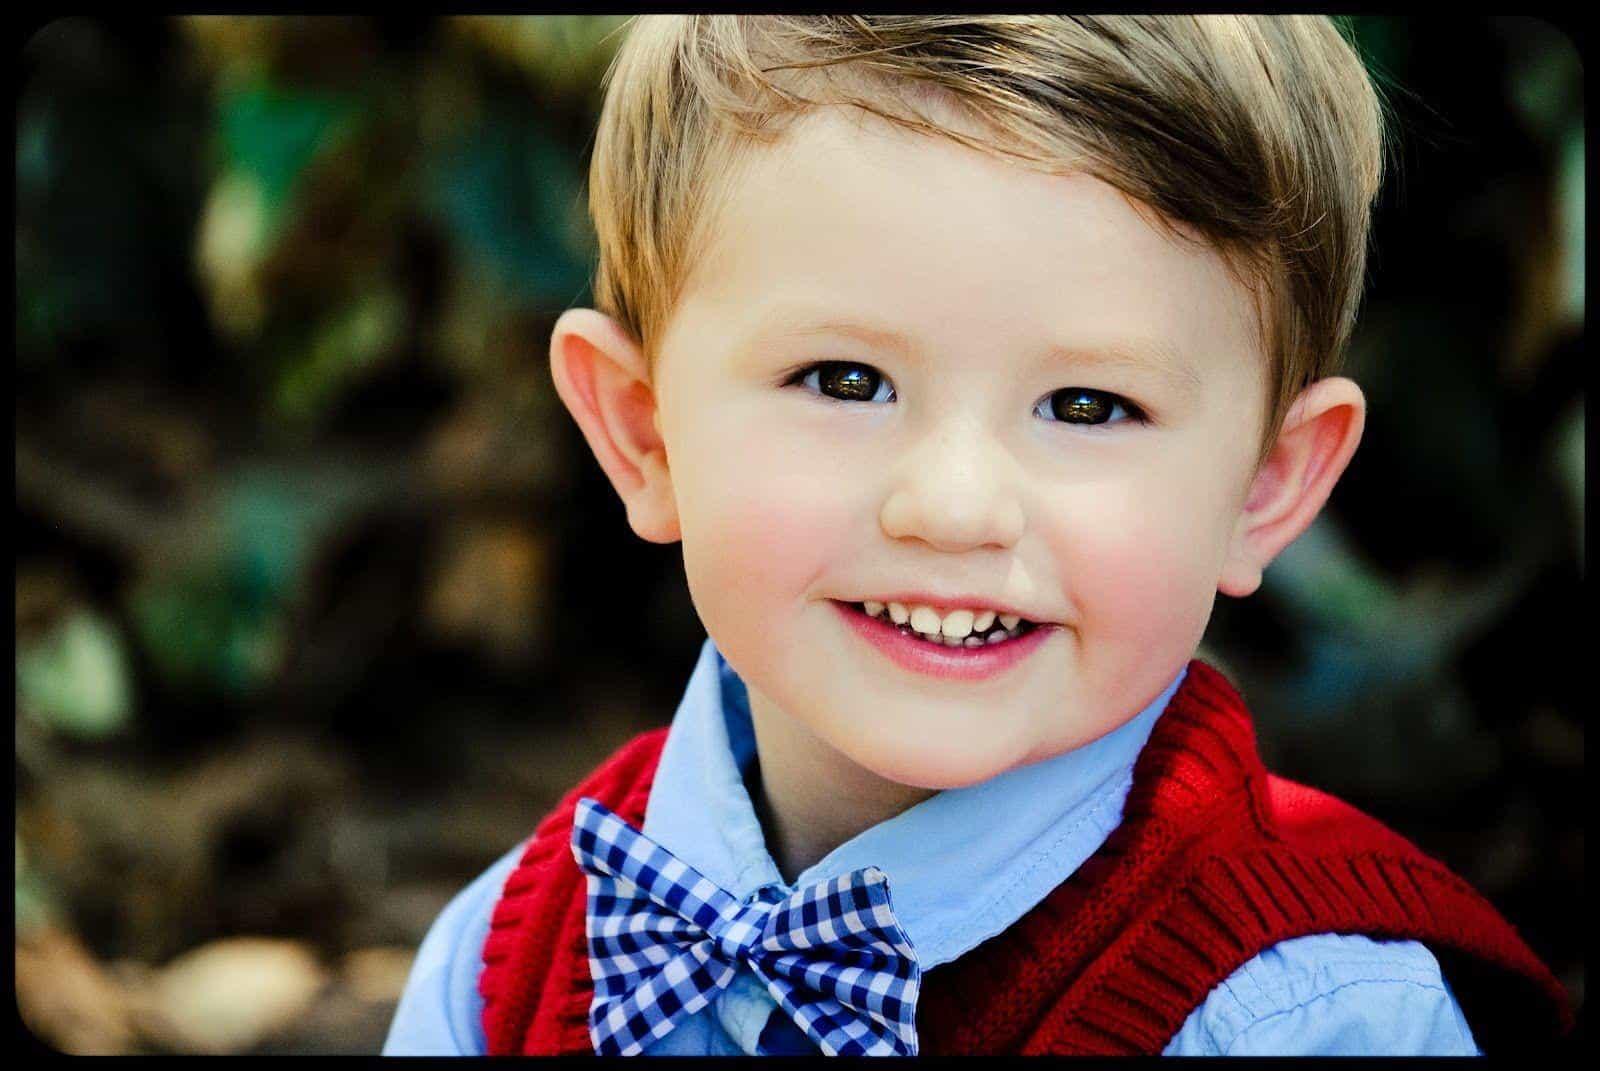 صوره طفل جميله جدا